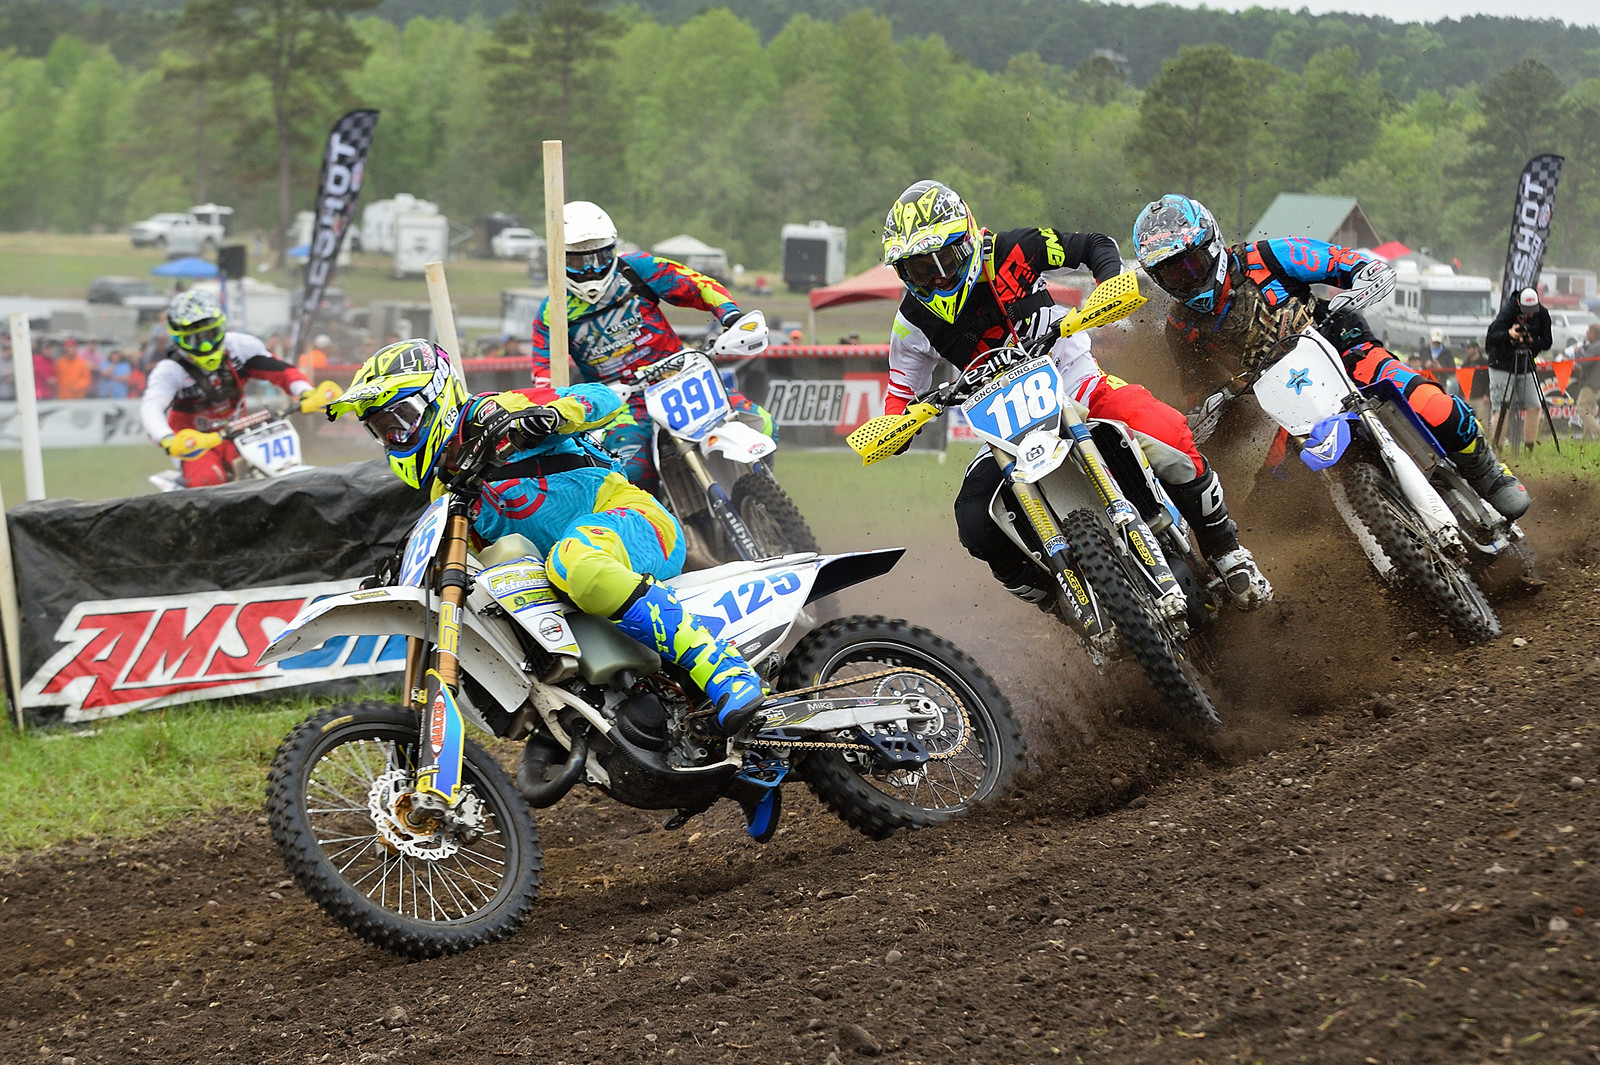 FMF XC3 - GuyB - Motocross Pictures - Vital MX